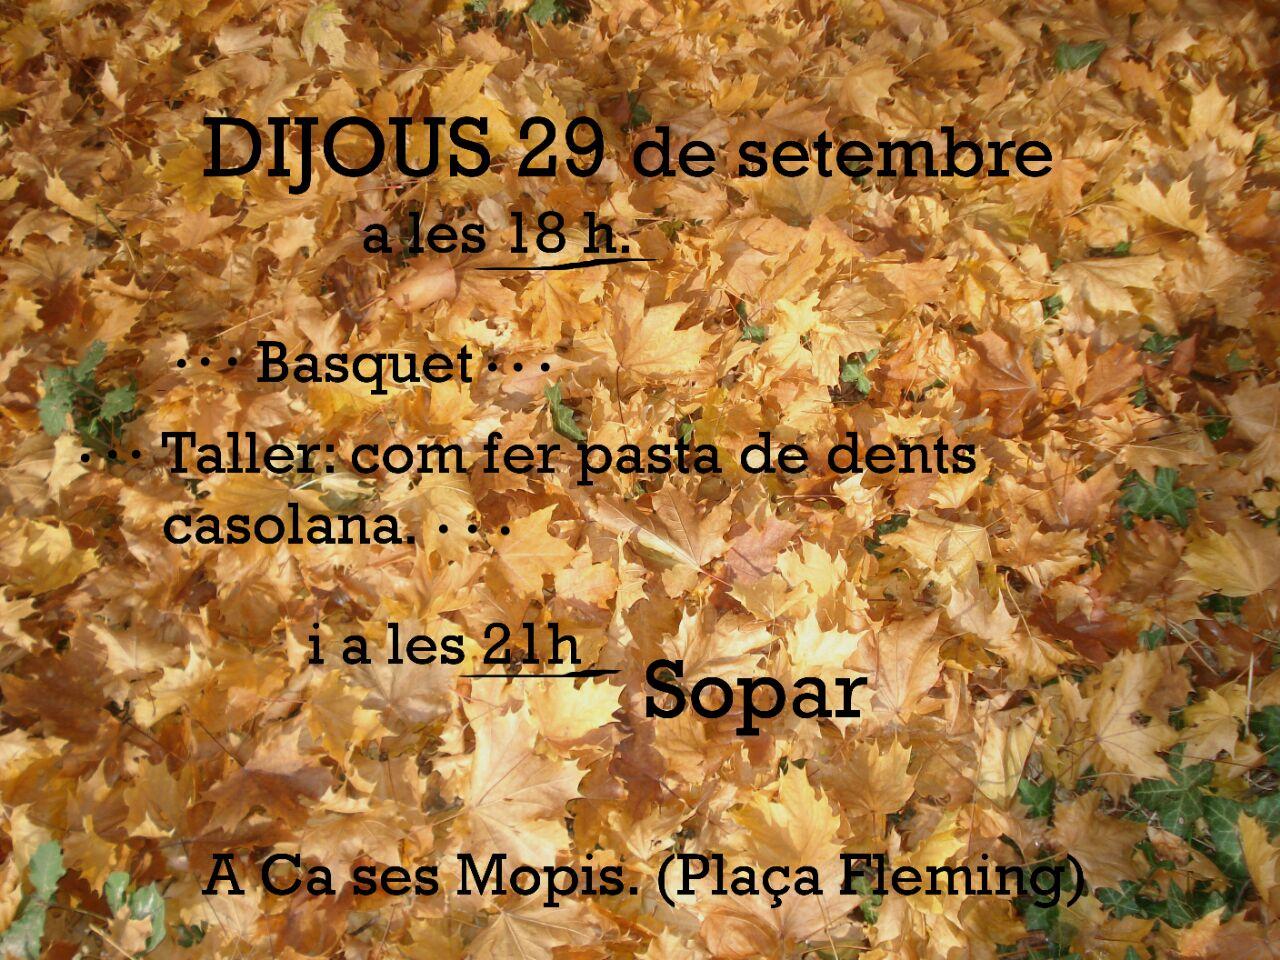 IMG_2016-09-28 17:31:10